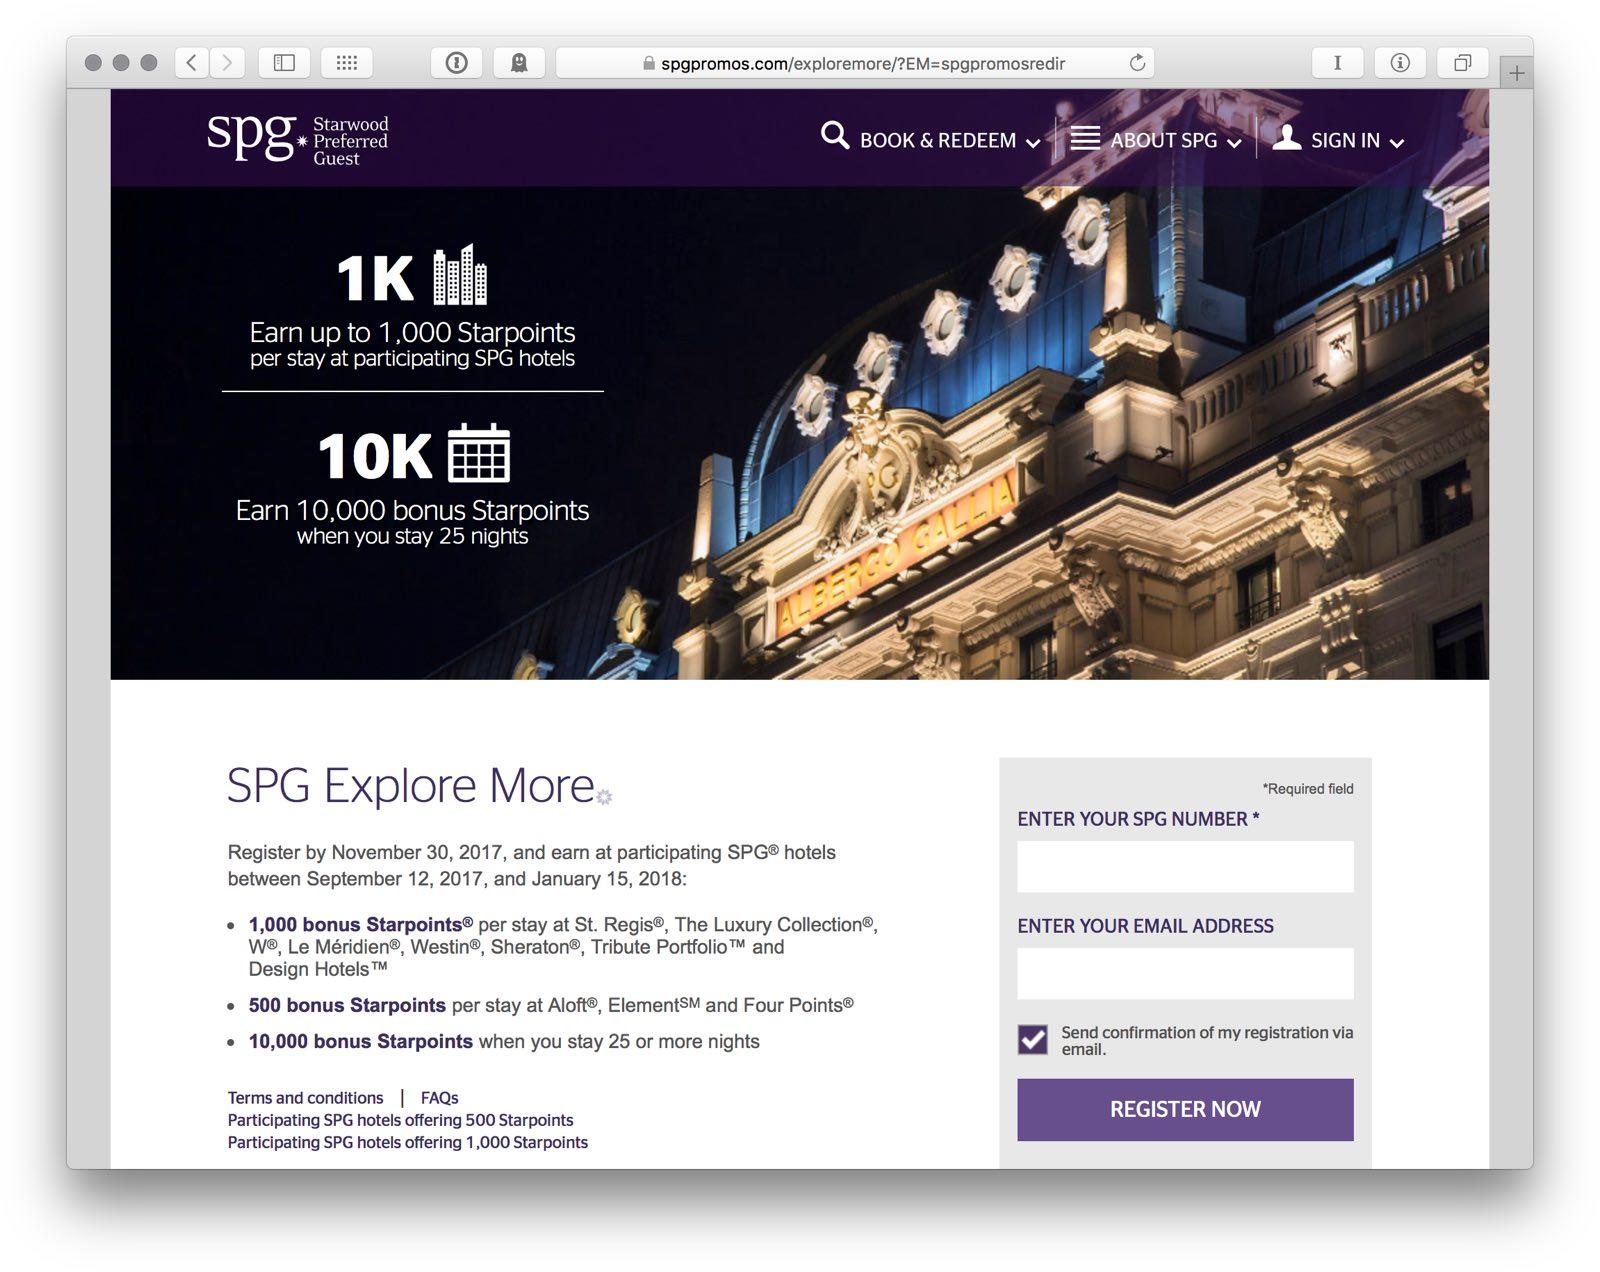 SPG Explore More